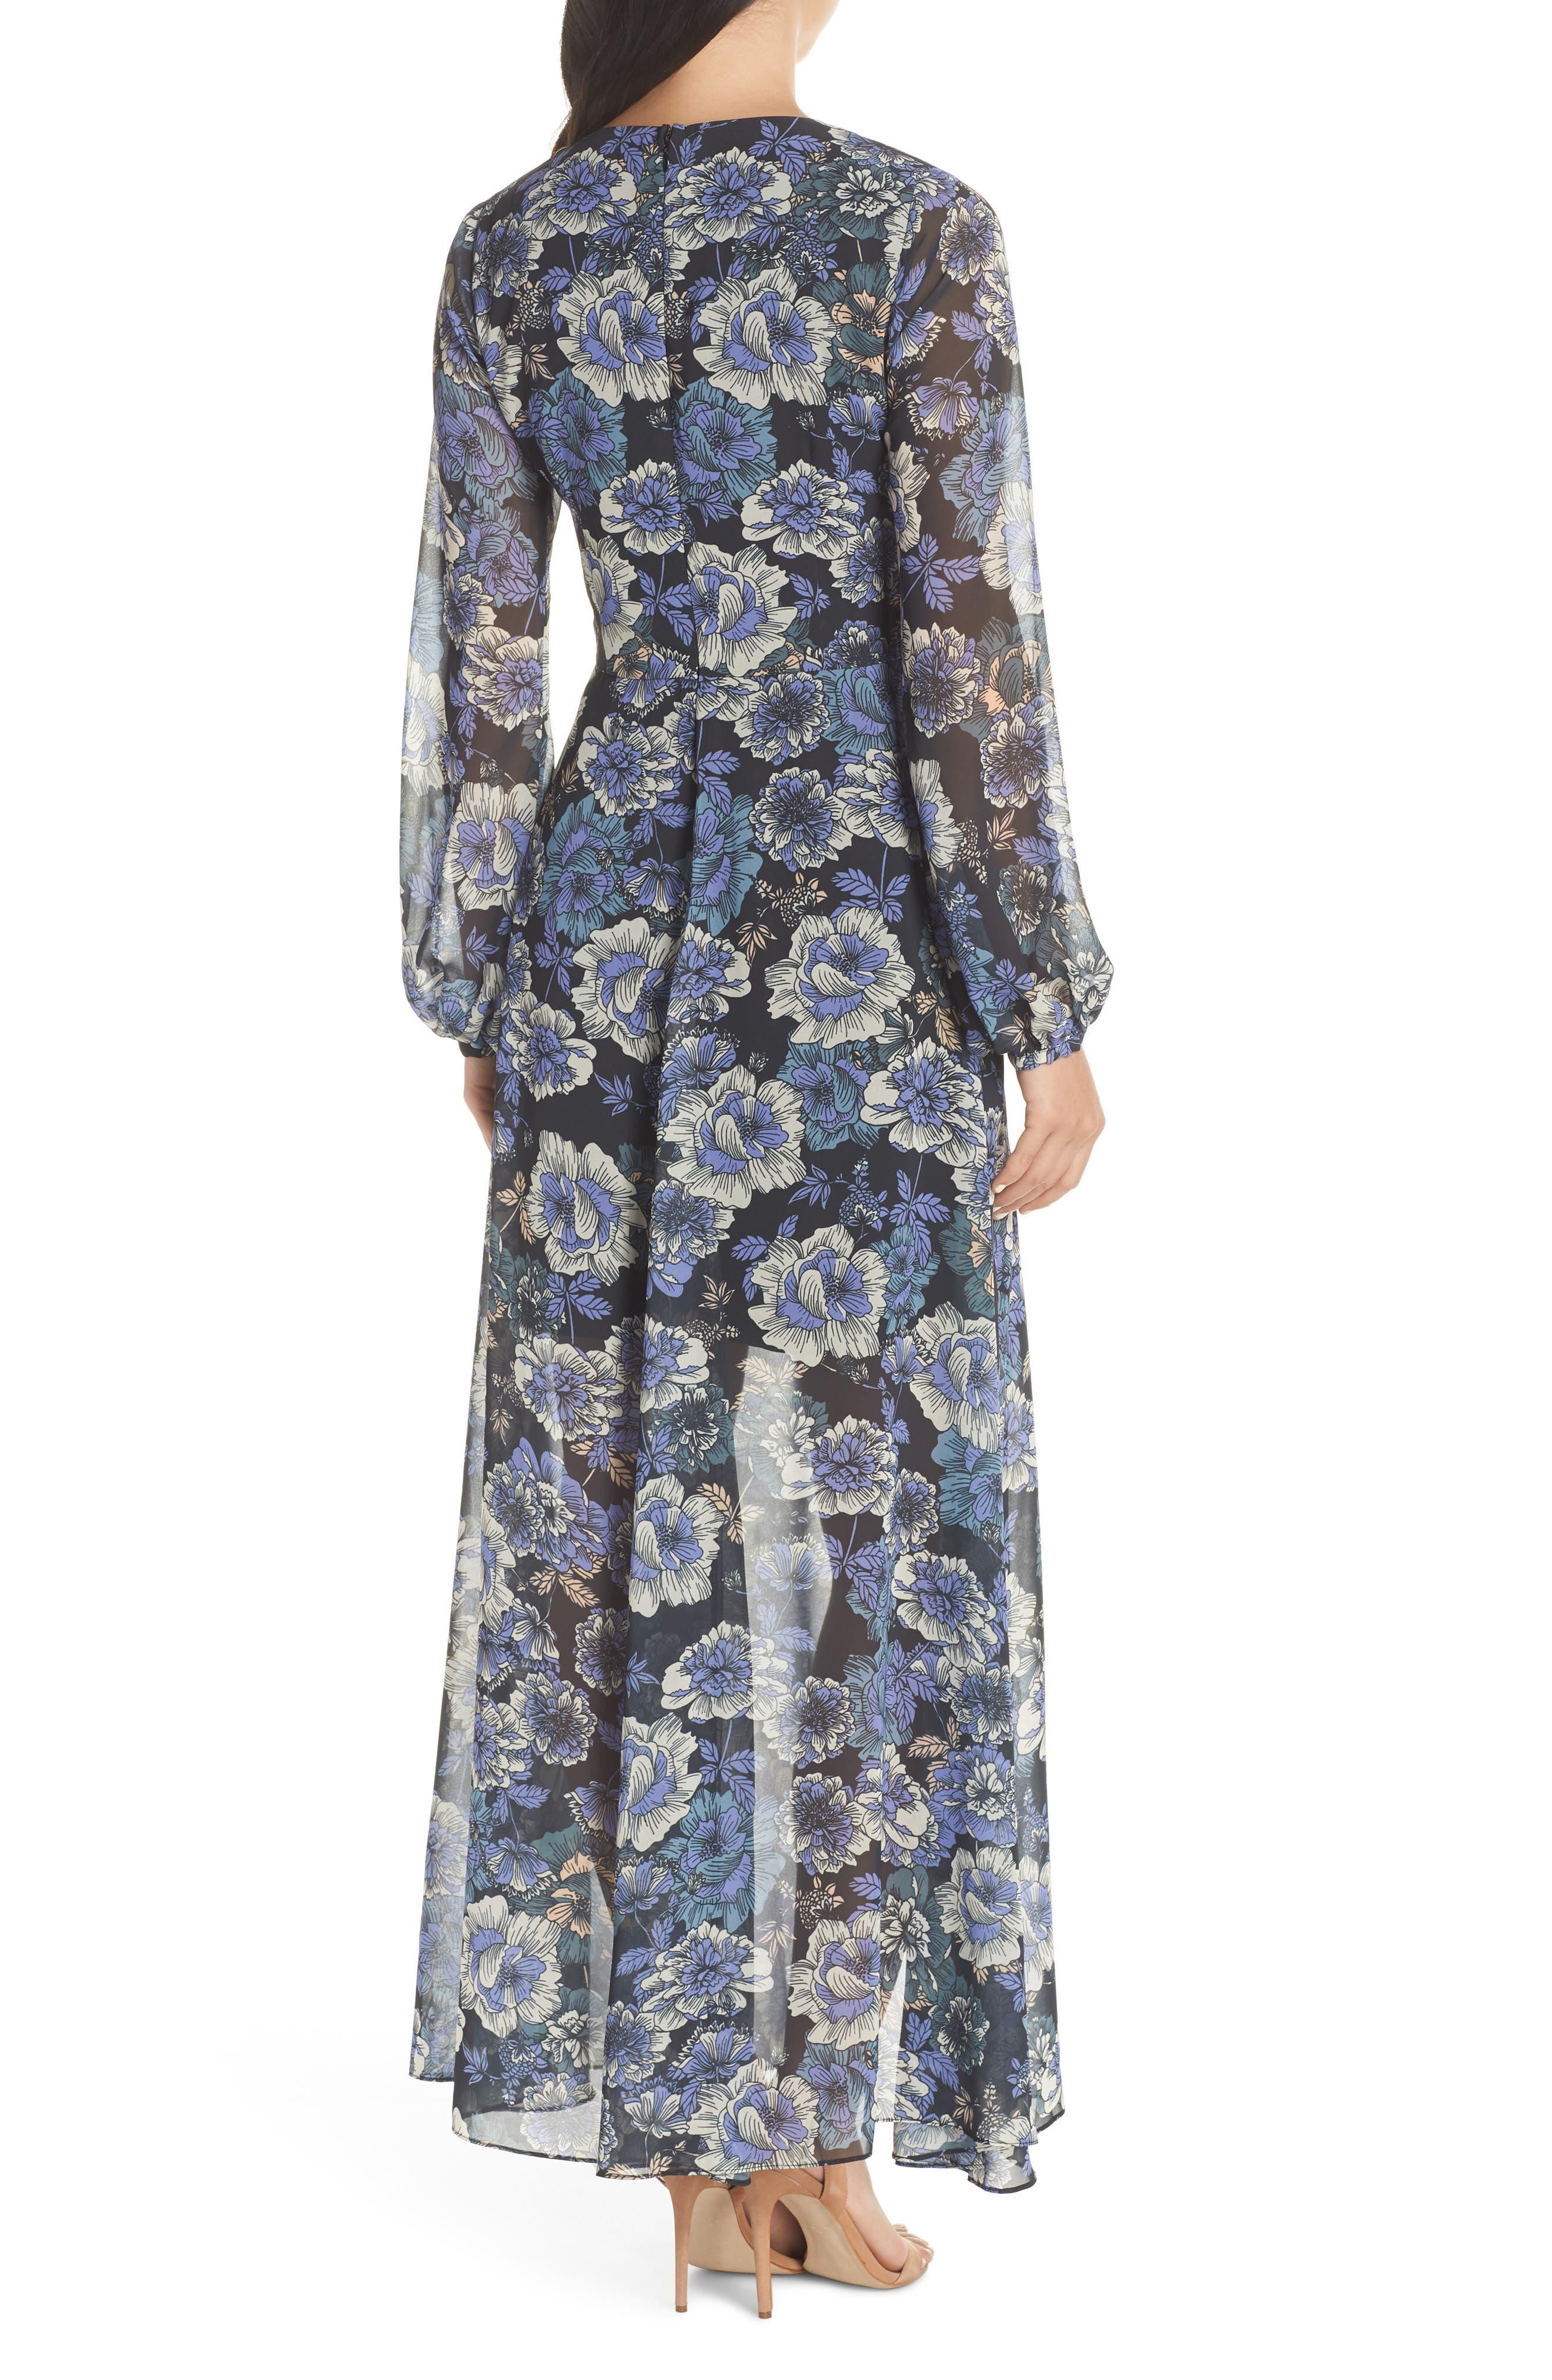 COOPER ST,                             Floral Fantasy Maxi Dress,                             Alternate thumbnail 2, color,                             PRINT